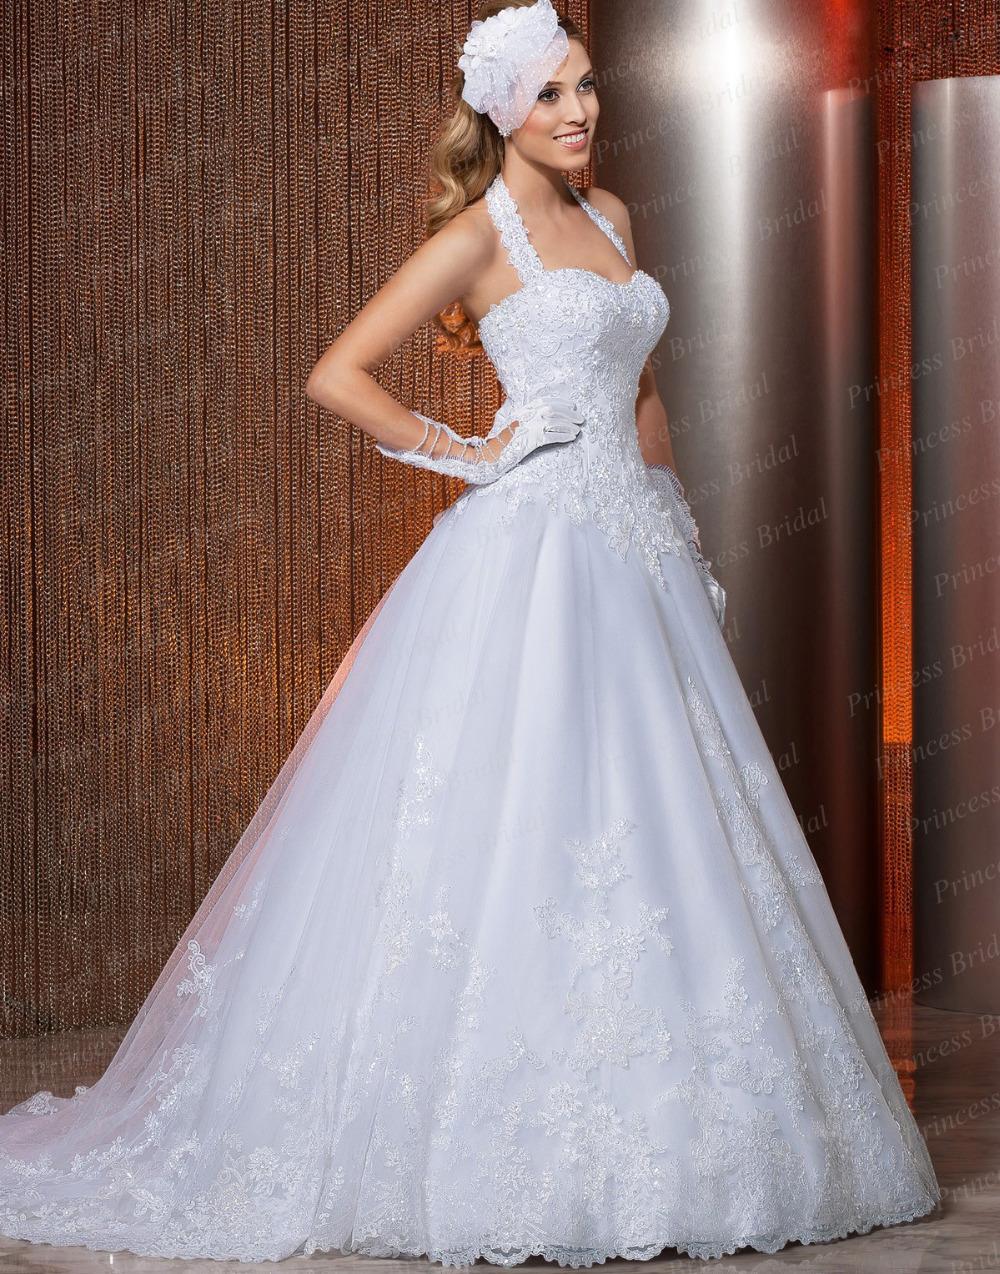 wedding dress bustier top wedding dress corset top Girdle For Wedding Dress Dresses Styles